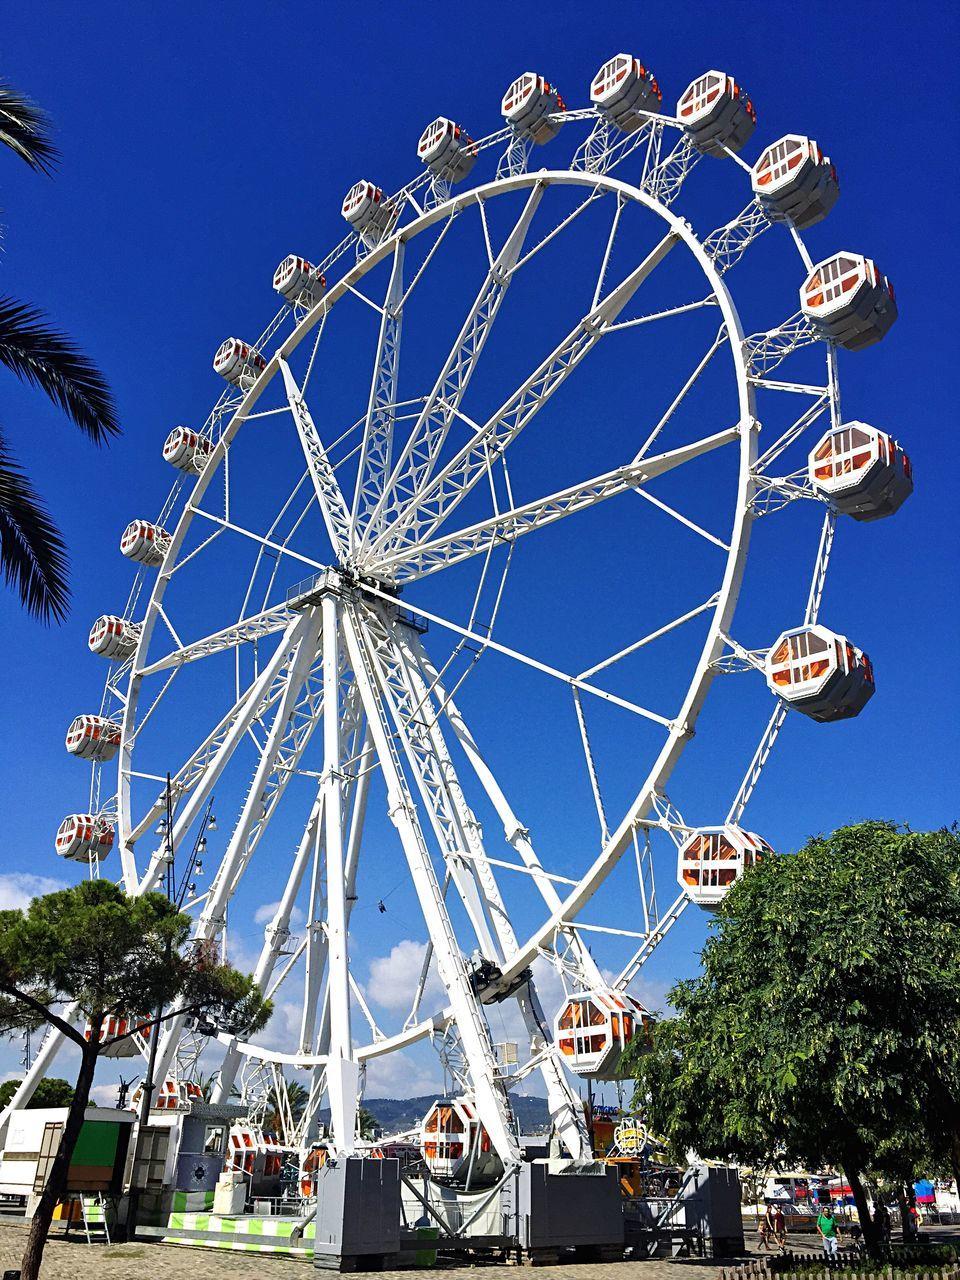 amusement park, arts culture and entertainment, ferris wheel, blue, amusement park ride, low angle view, clear sky, tree, leisure activity, day, outdoors, big wheel, sky, built structure, architecture, no people